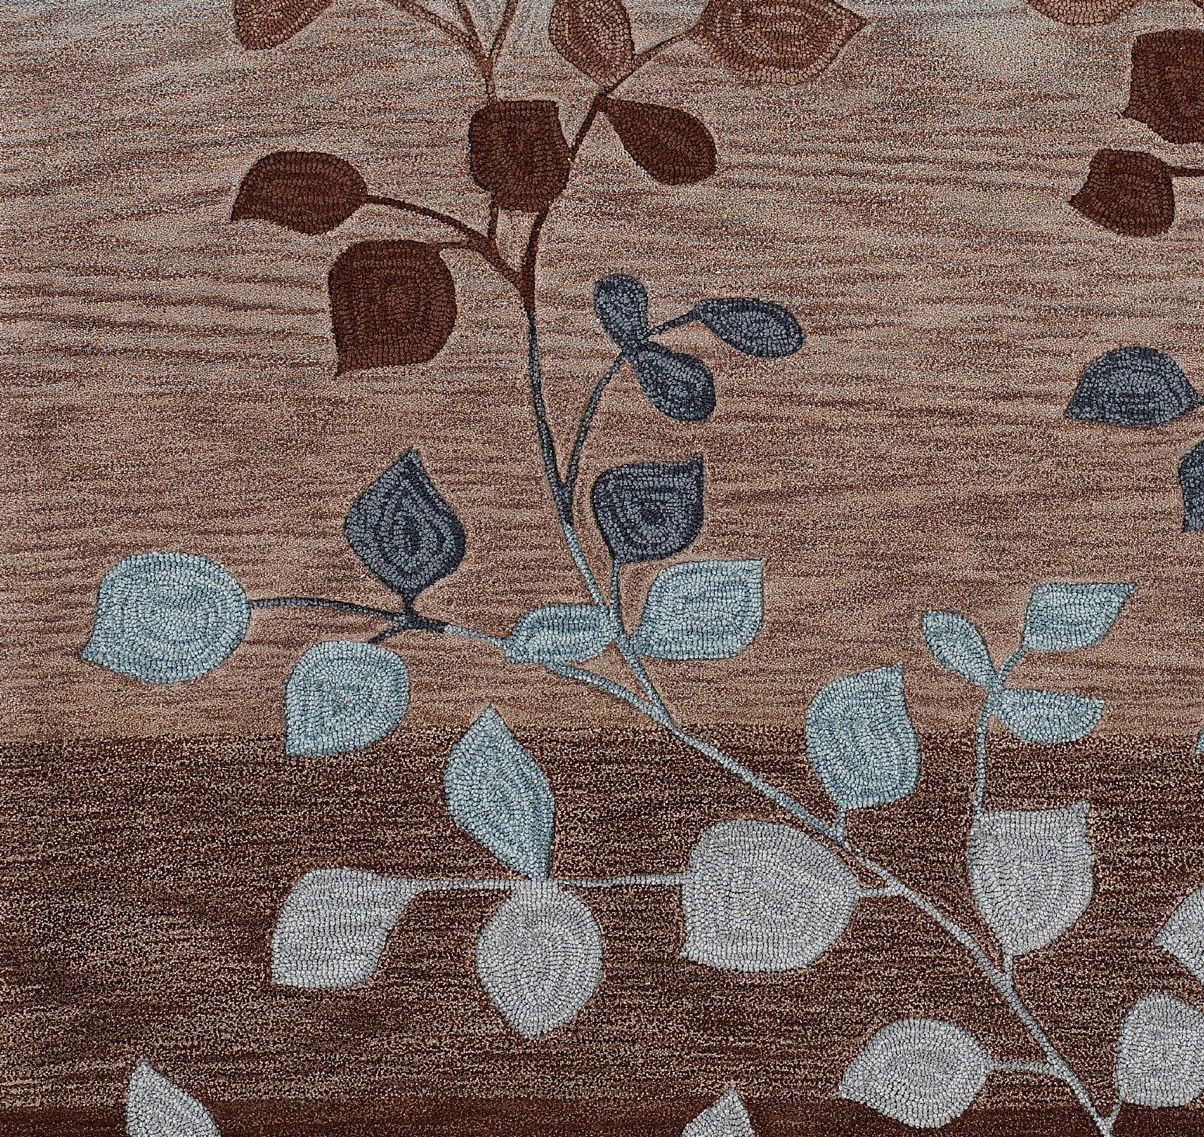 Modern Contemporary Area Rugs Rug Carpet Mocha Blue 2 X 5 Runner Stripes